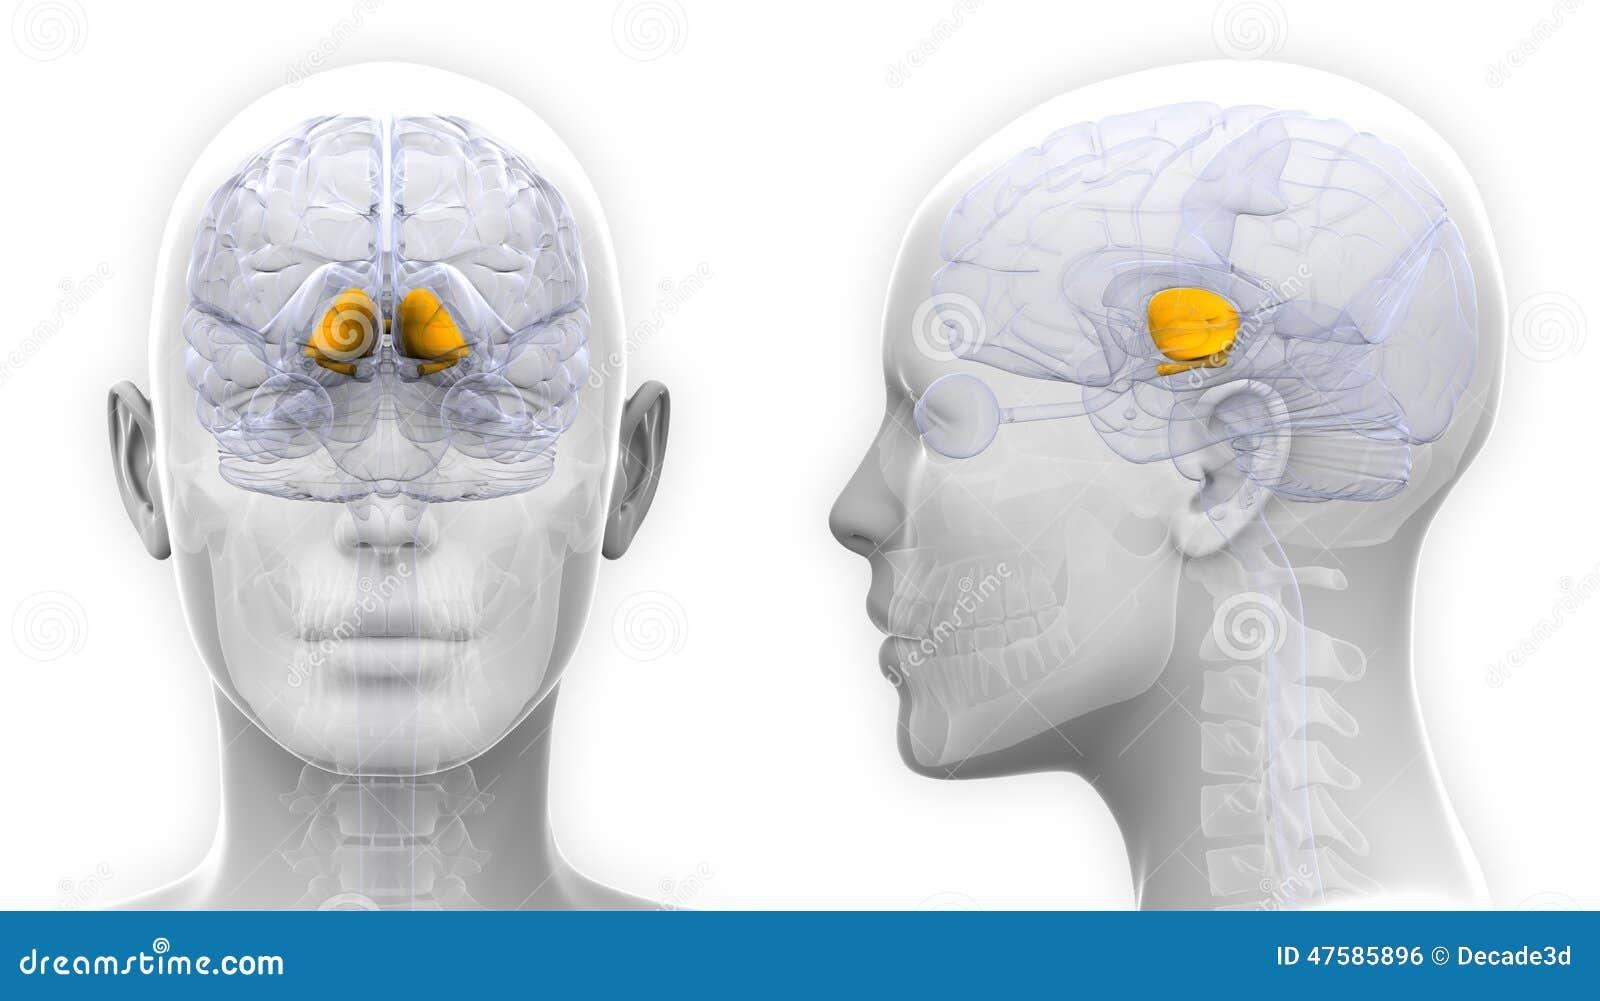 Female Basal Ganglia Brain Anatomy Isolated On White Stock